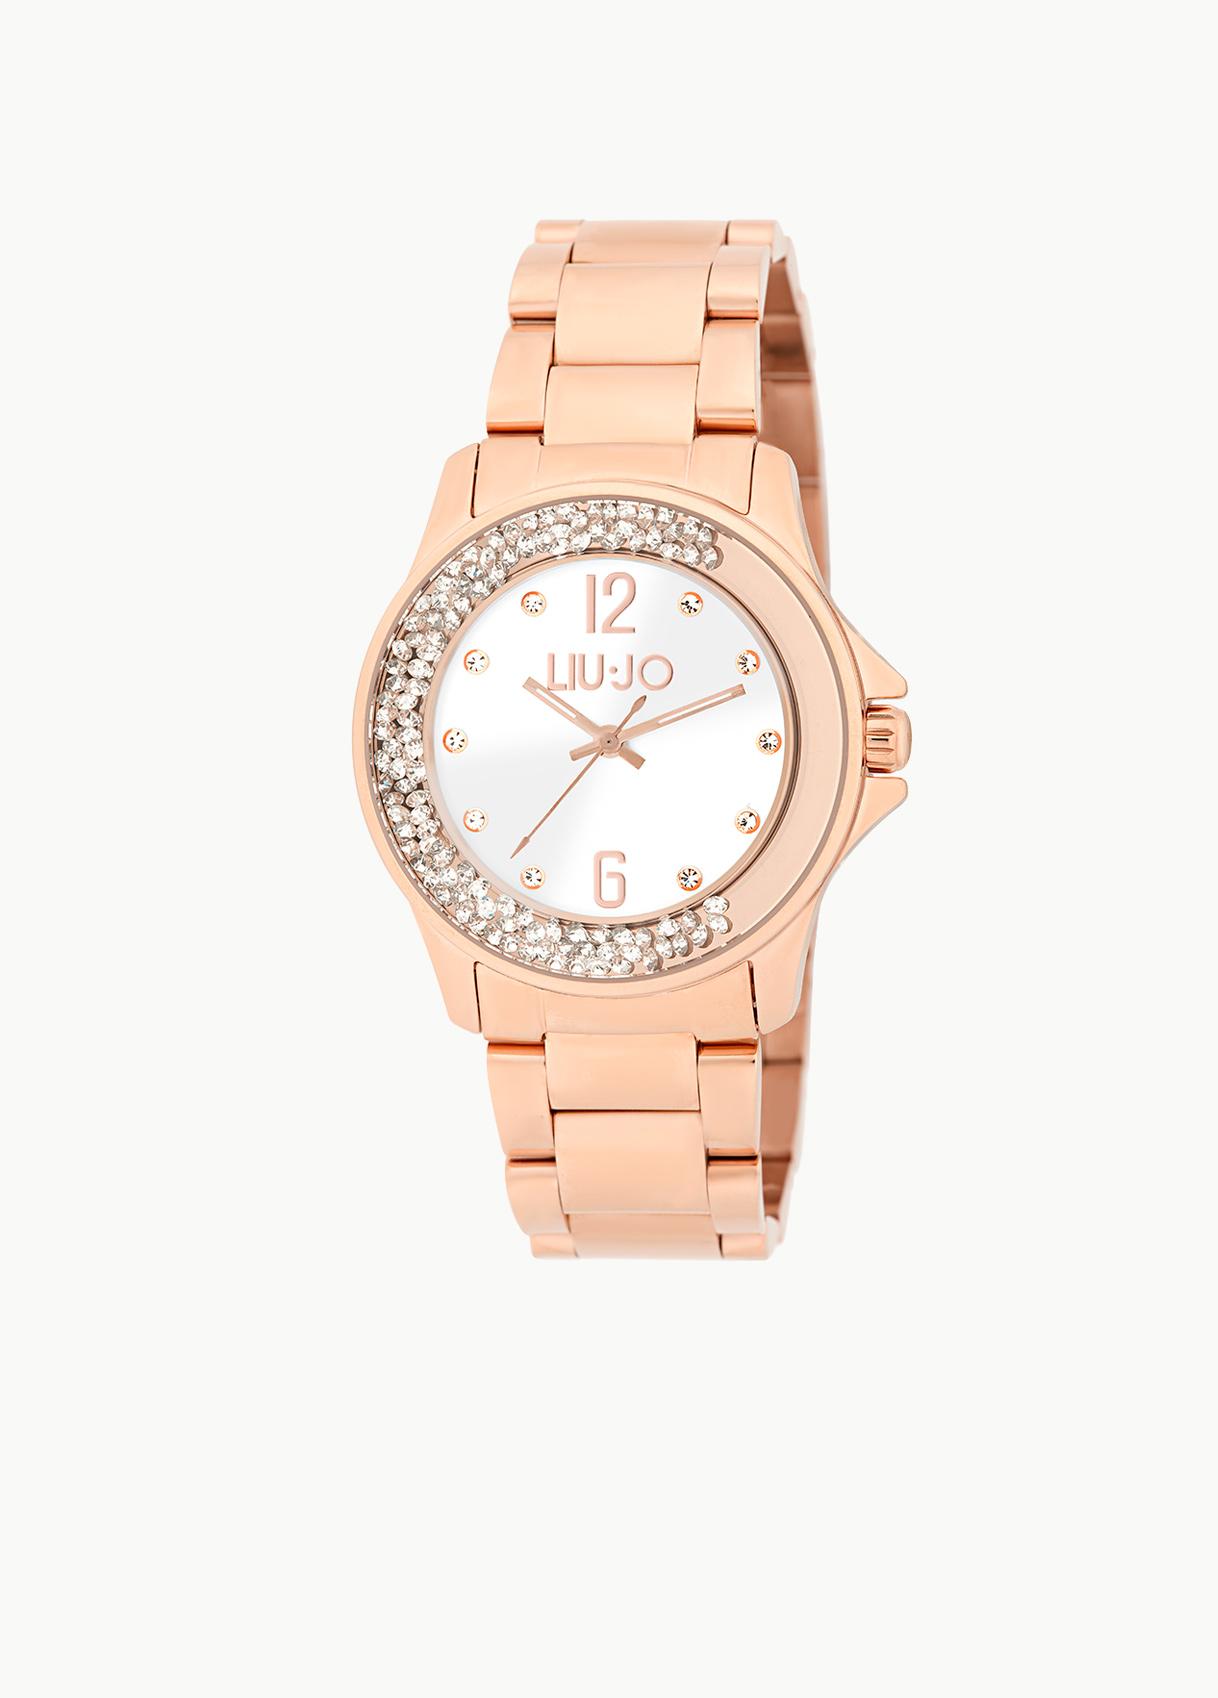 Celebridad azufre bolsillo  Watch